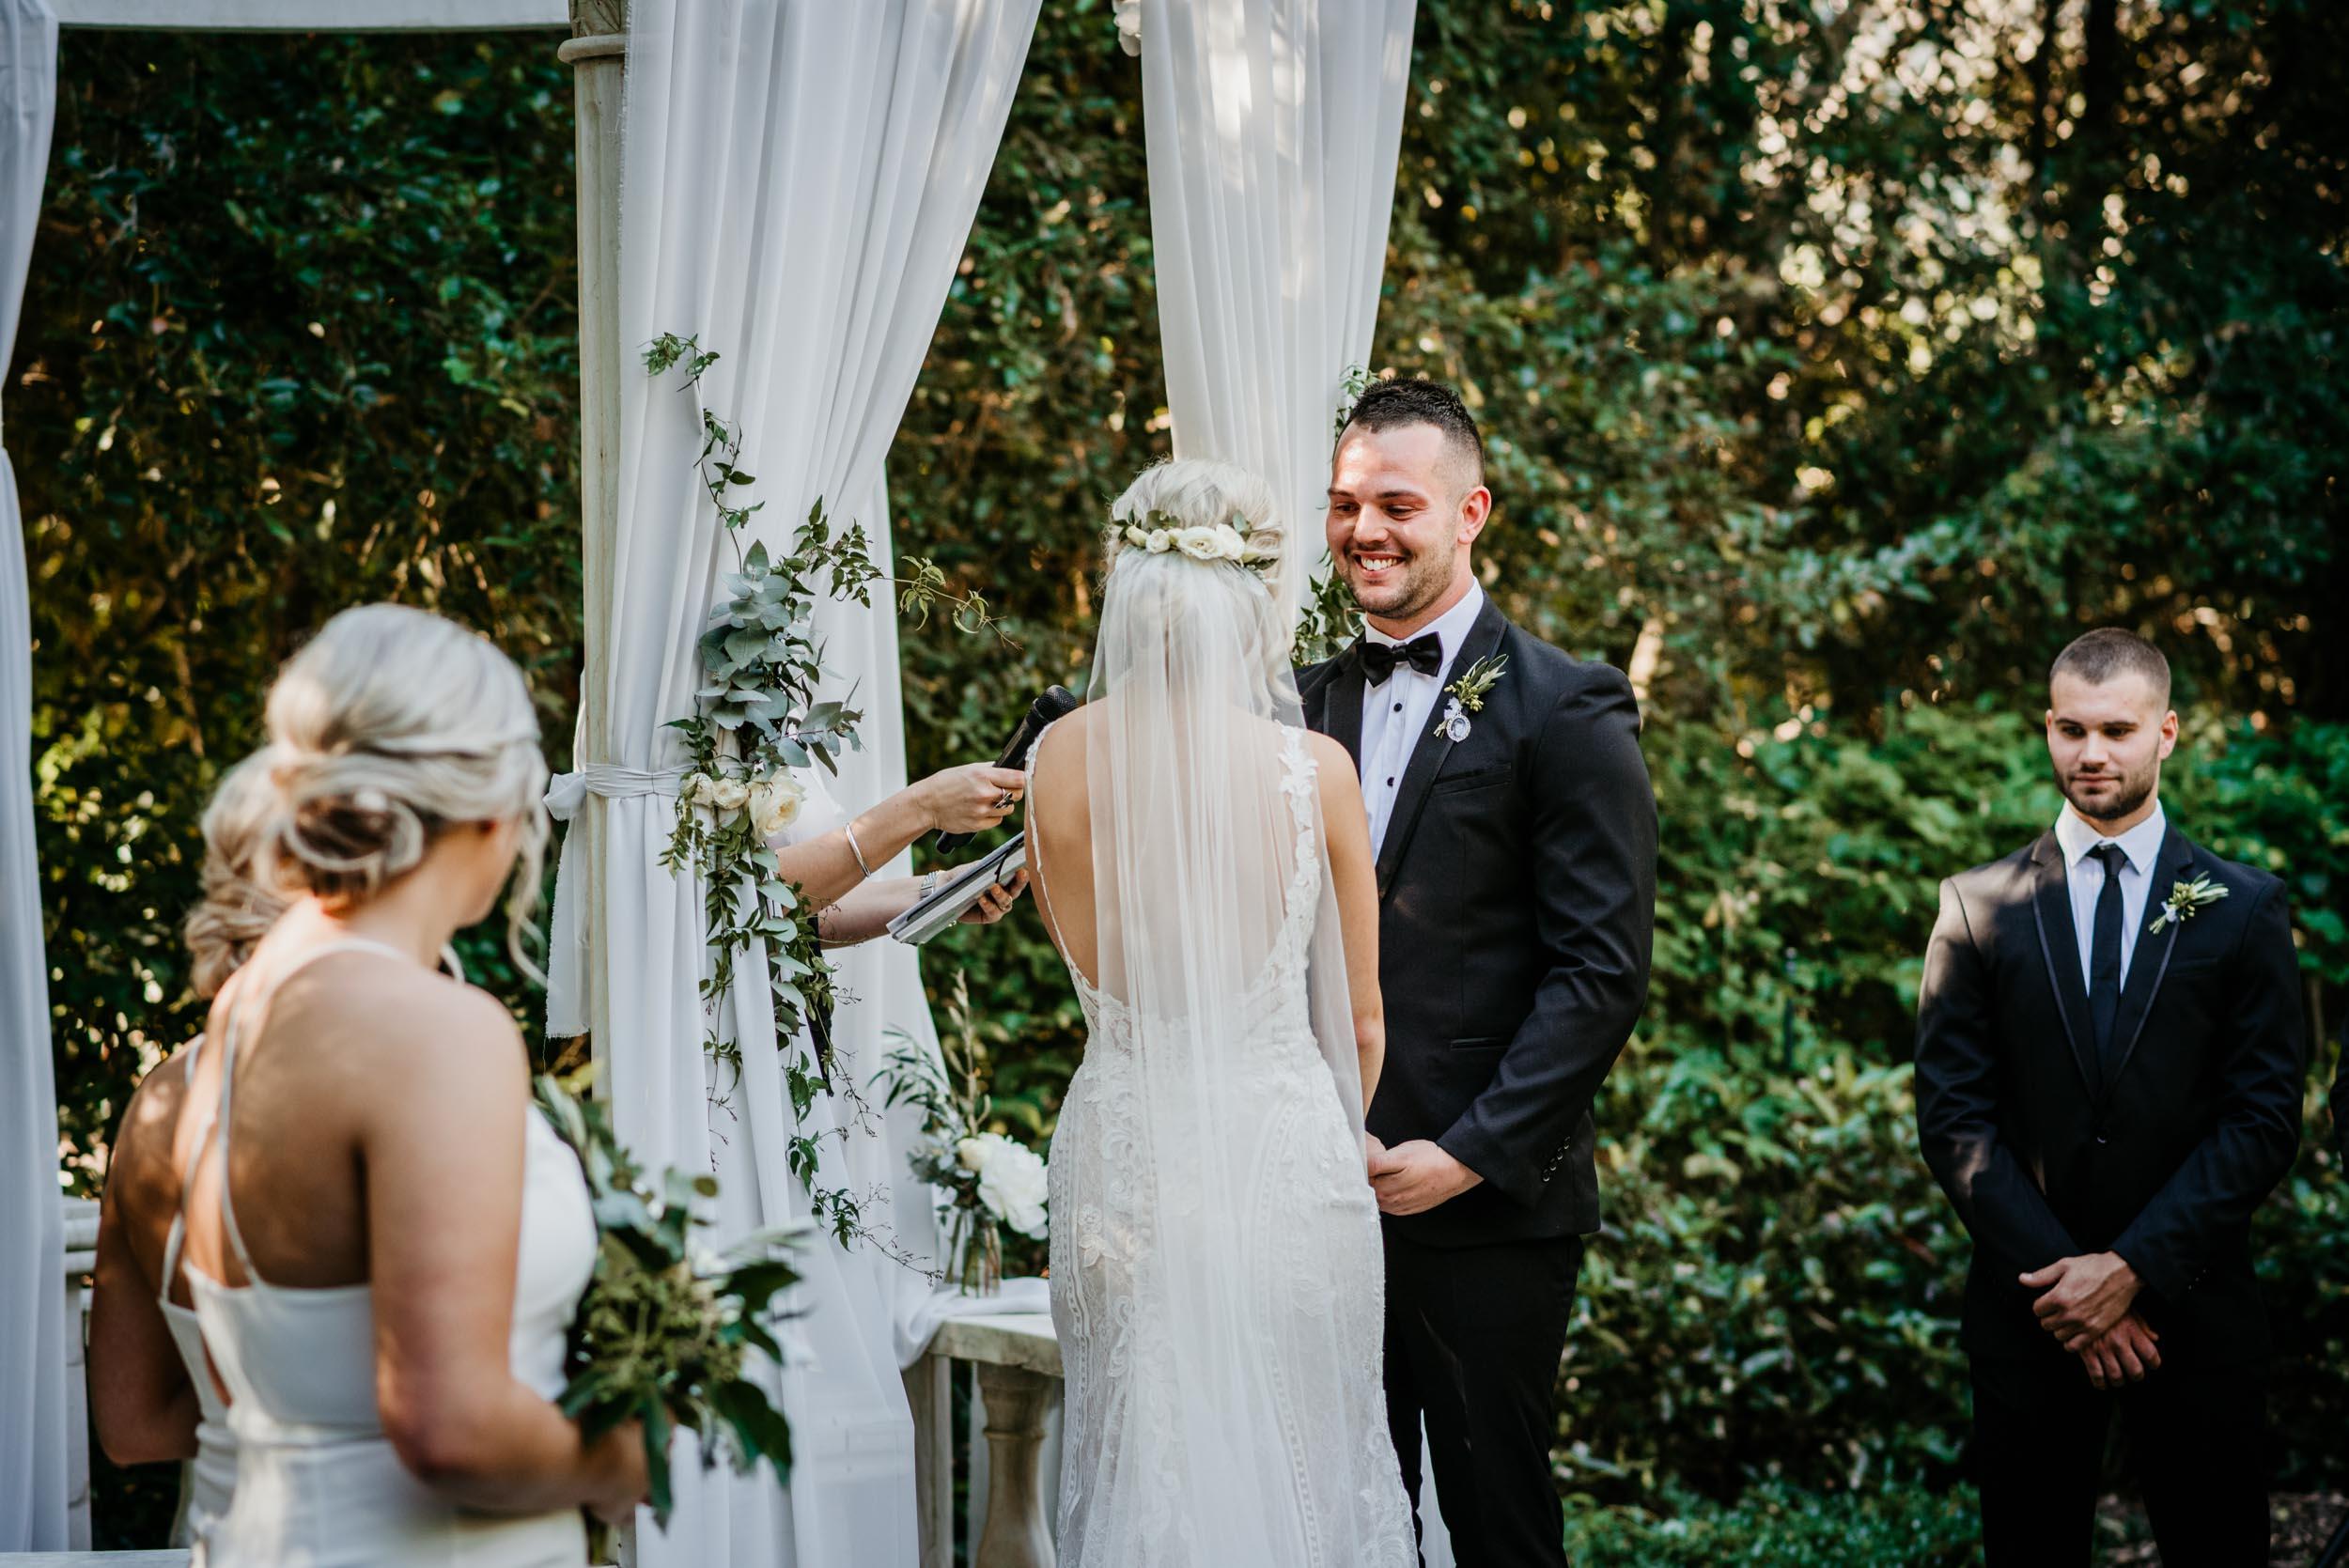 The Raw Photographer - Cairns Wedding Photographer - Laloli - Cairns Garden Wedding - Bride Dress - Destination Wed - Outdoor Reception - Queensland Ceremony-30.jpg